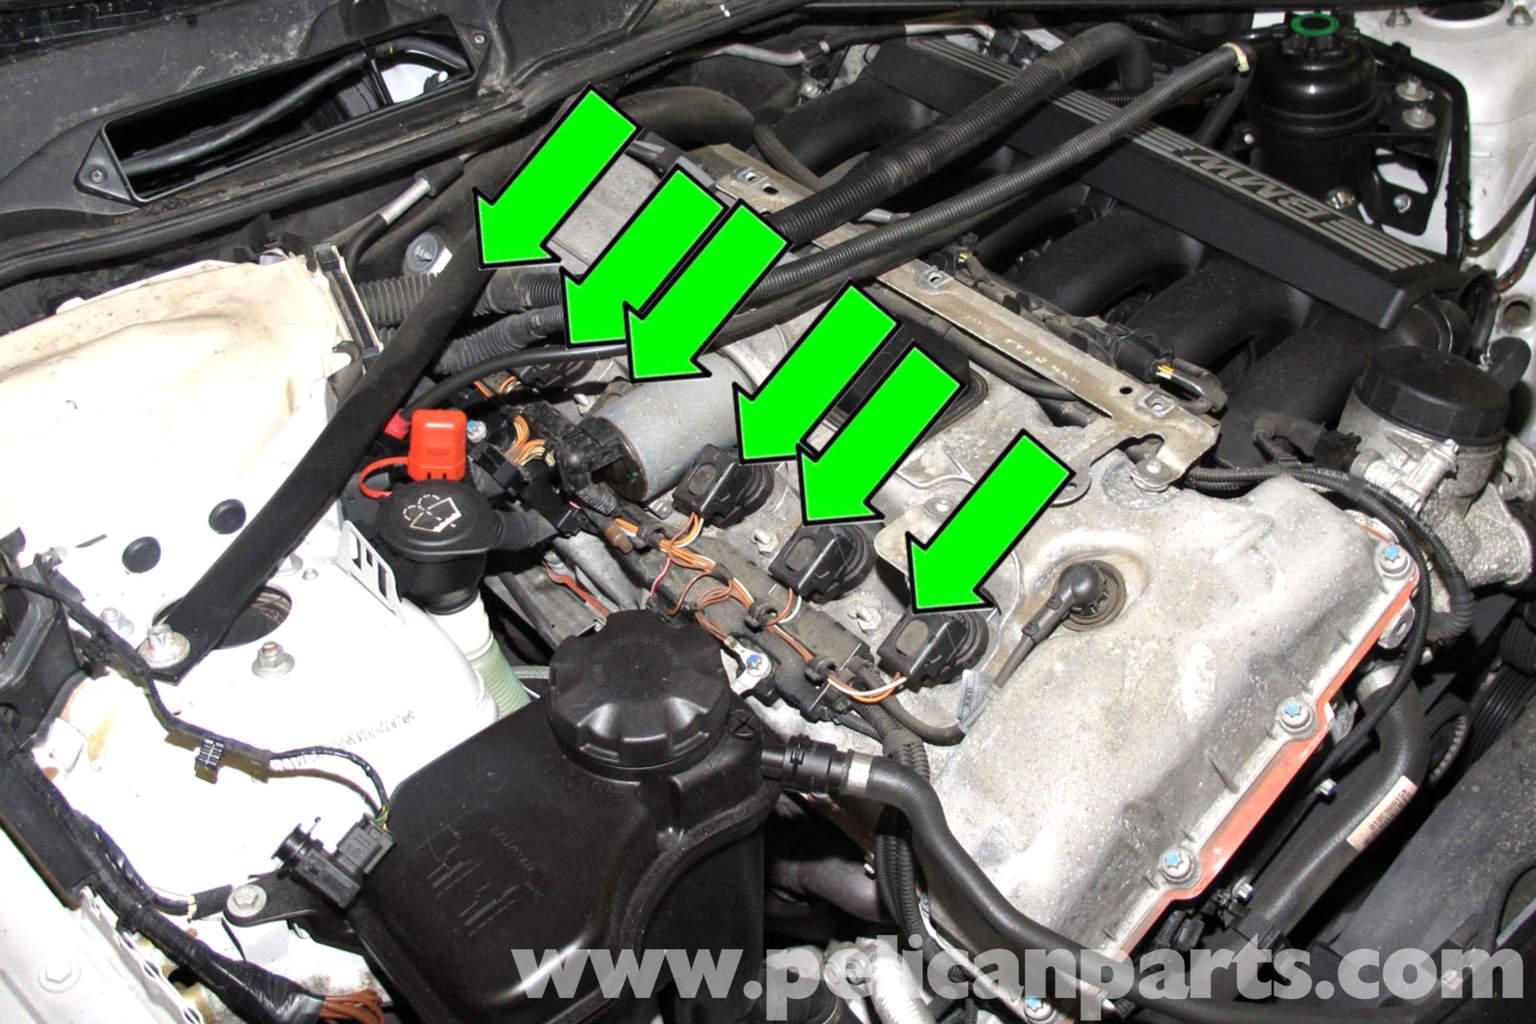 bmw e90 valvetronic motor replacement e91 e92 e93 pelican large image